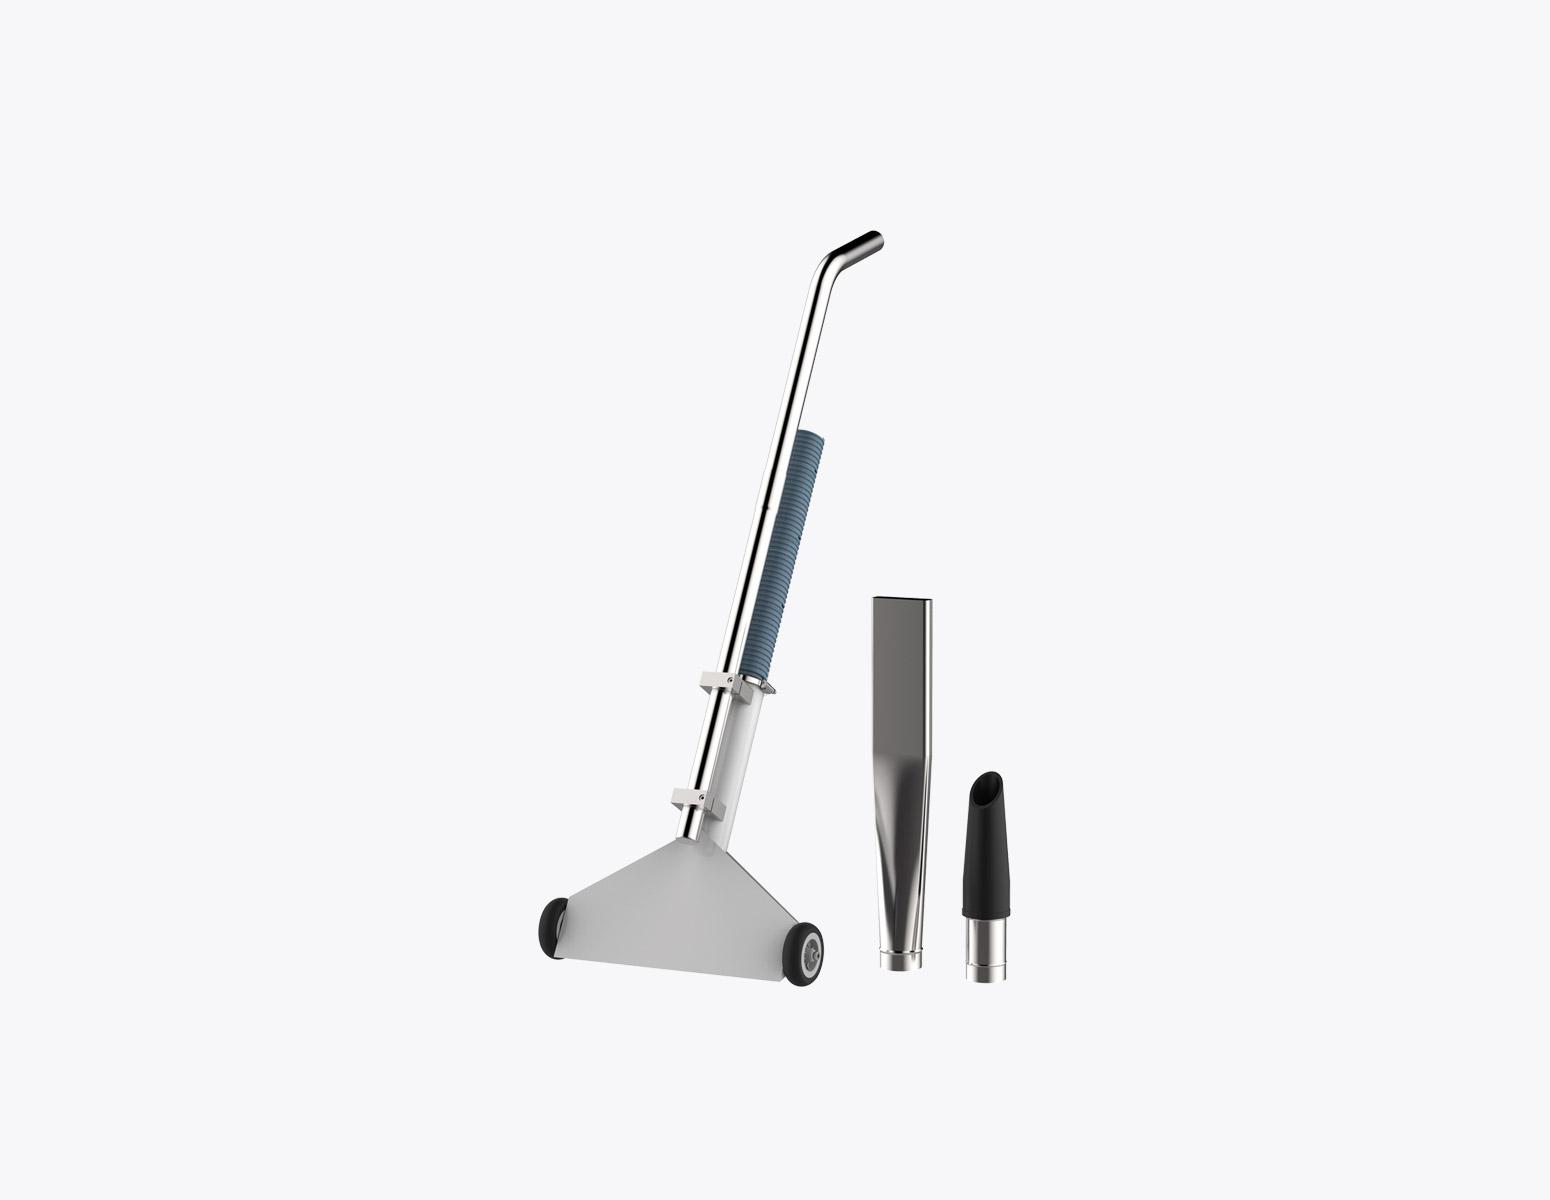 kleaning-kit-70mm-industrial-vacuum-cleaners-ivision-vacuum